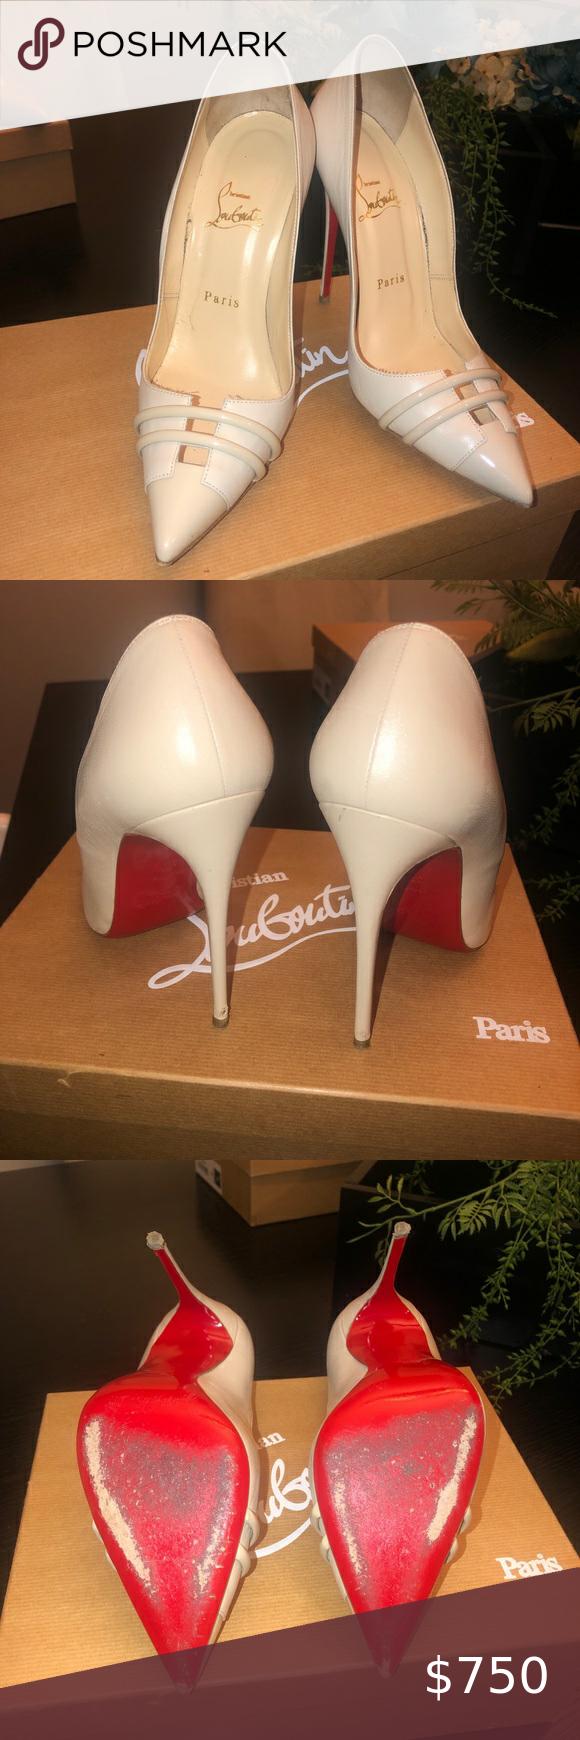 Christian Louboutin front double 120 colombe heels Beautiful christian louboutin...